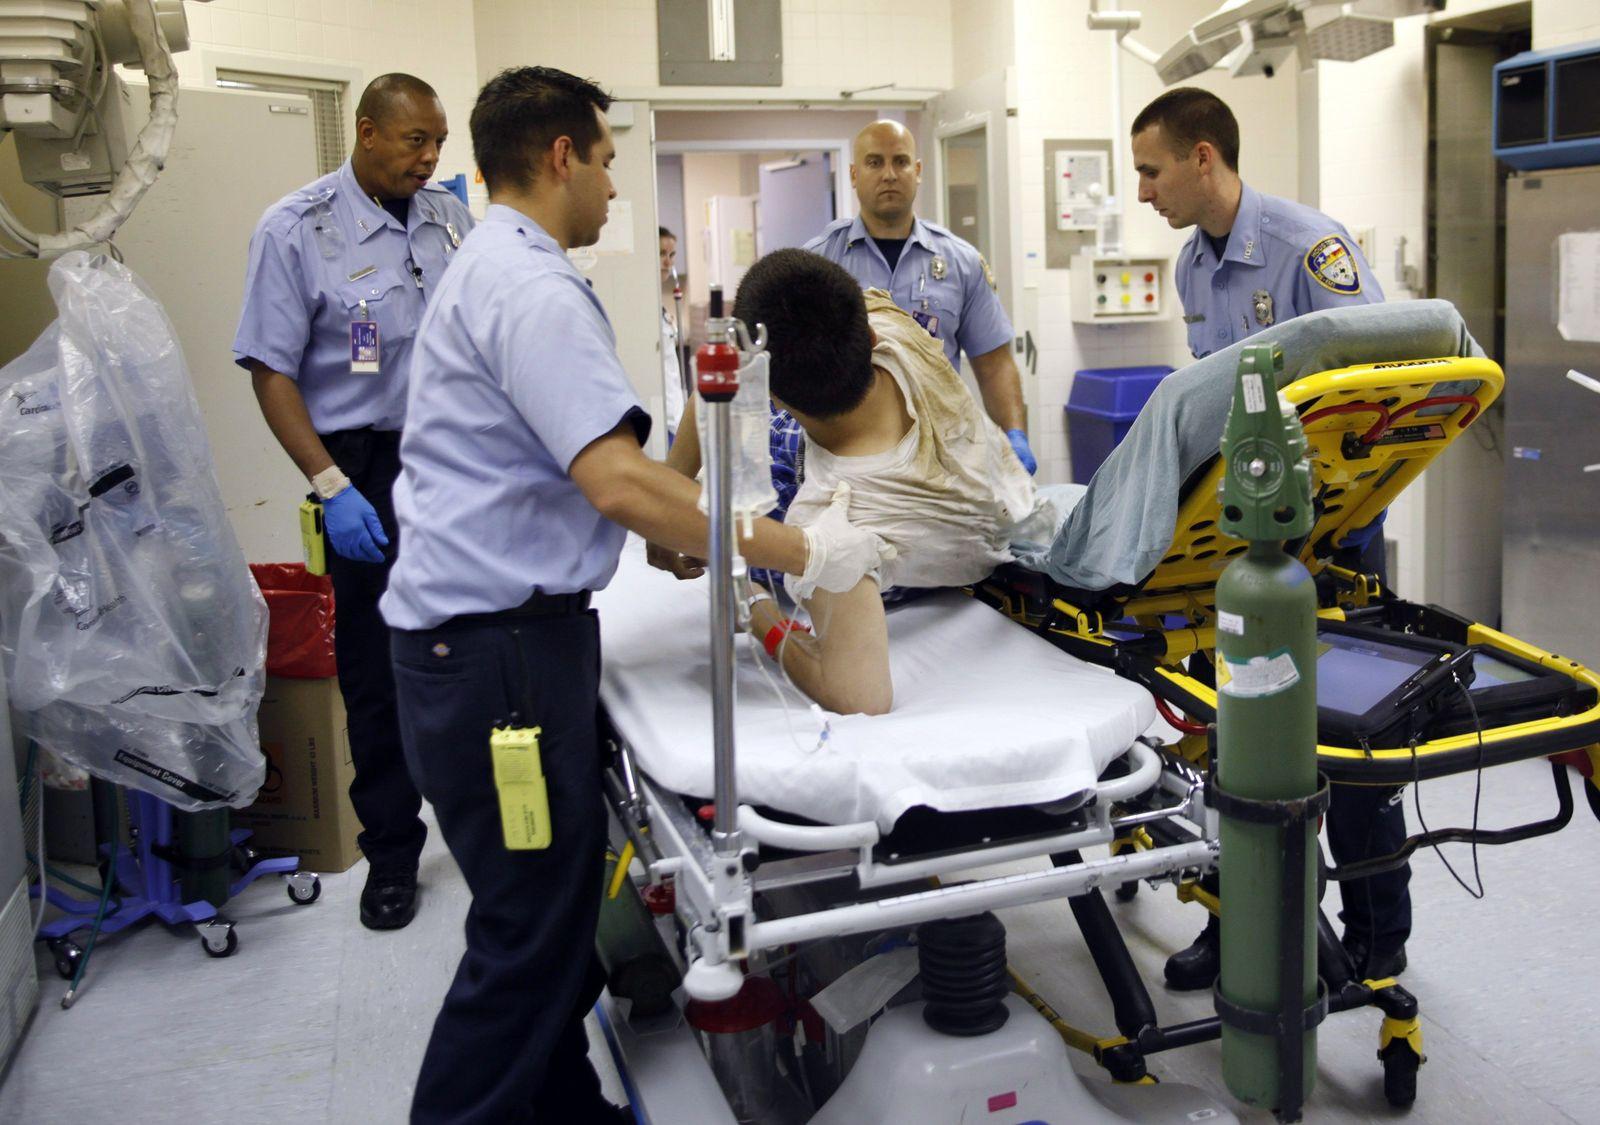 USA Krankenhaus Notaufnahme